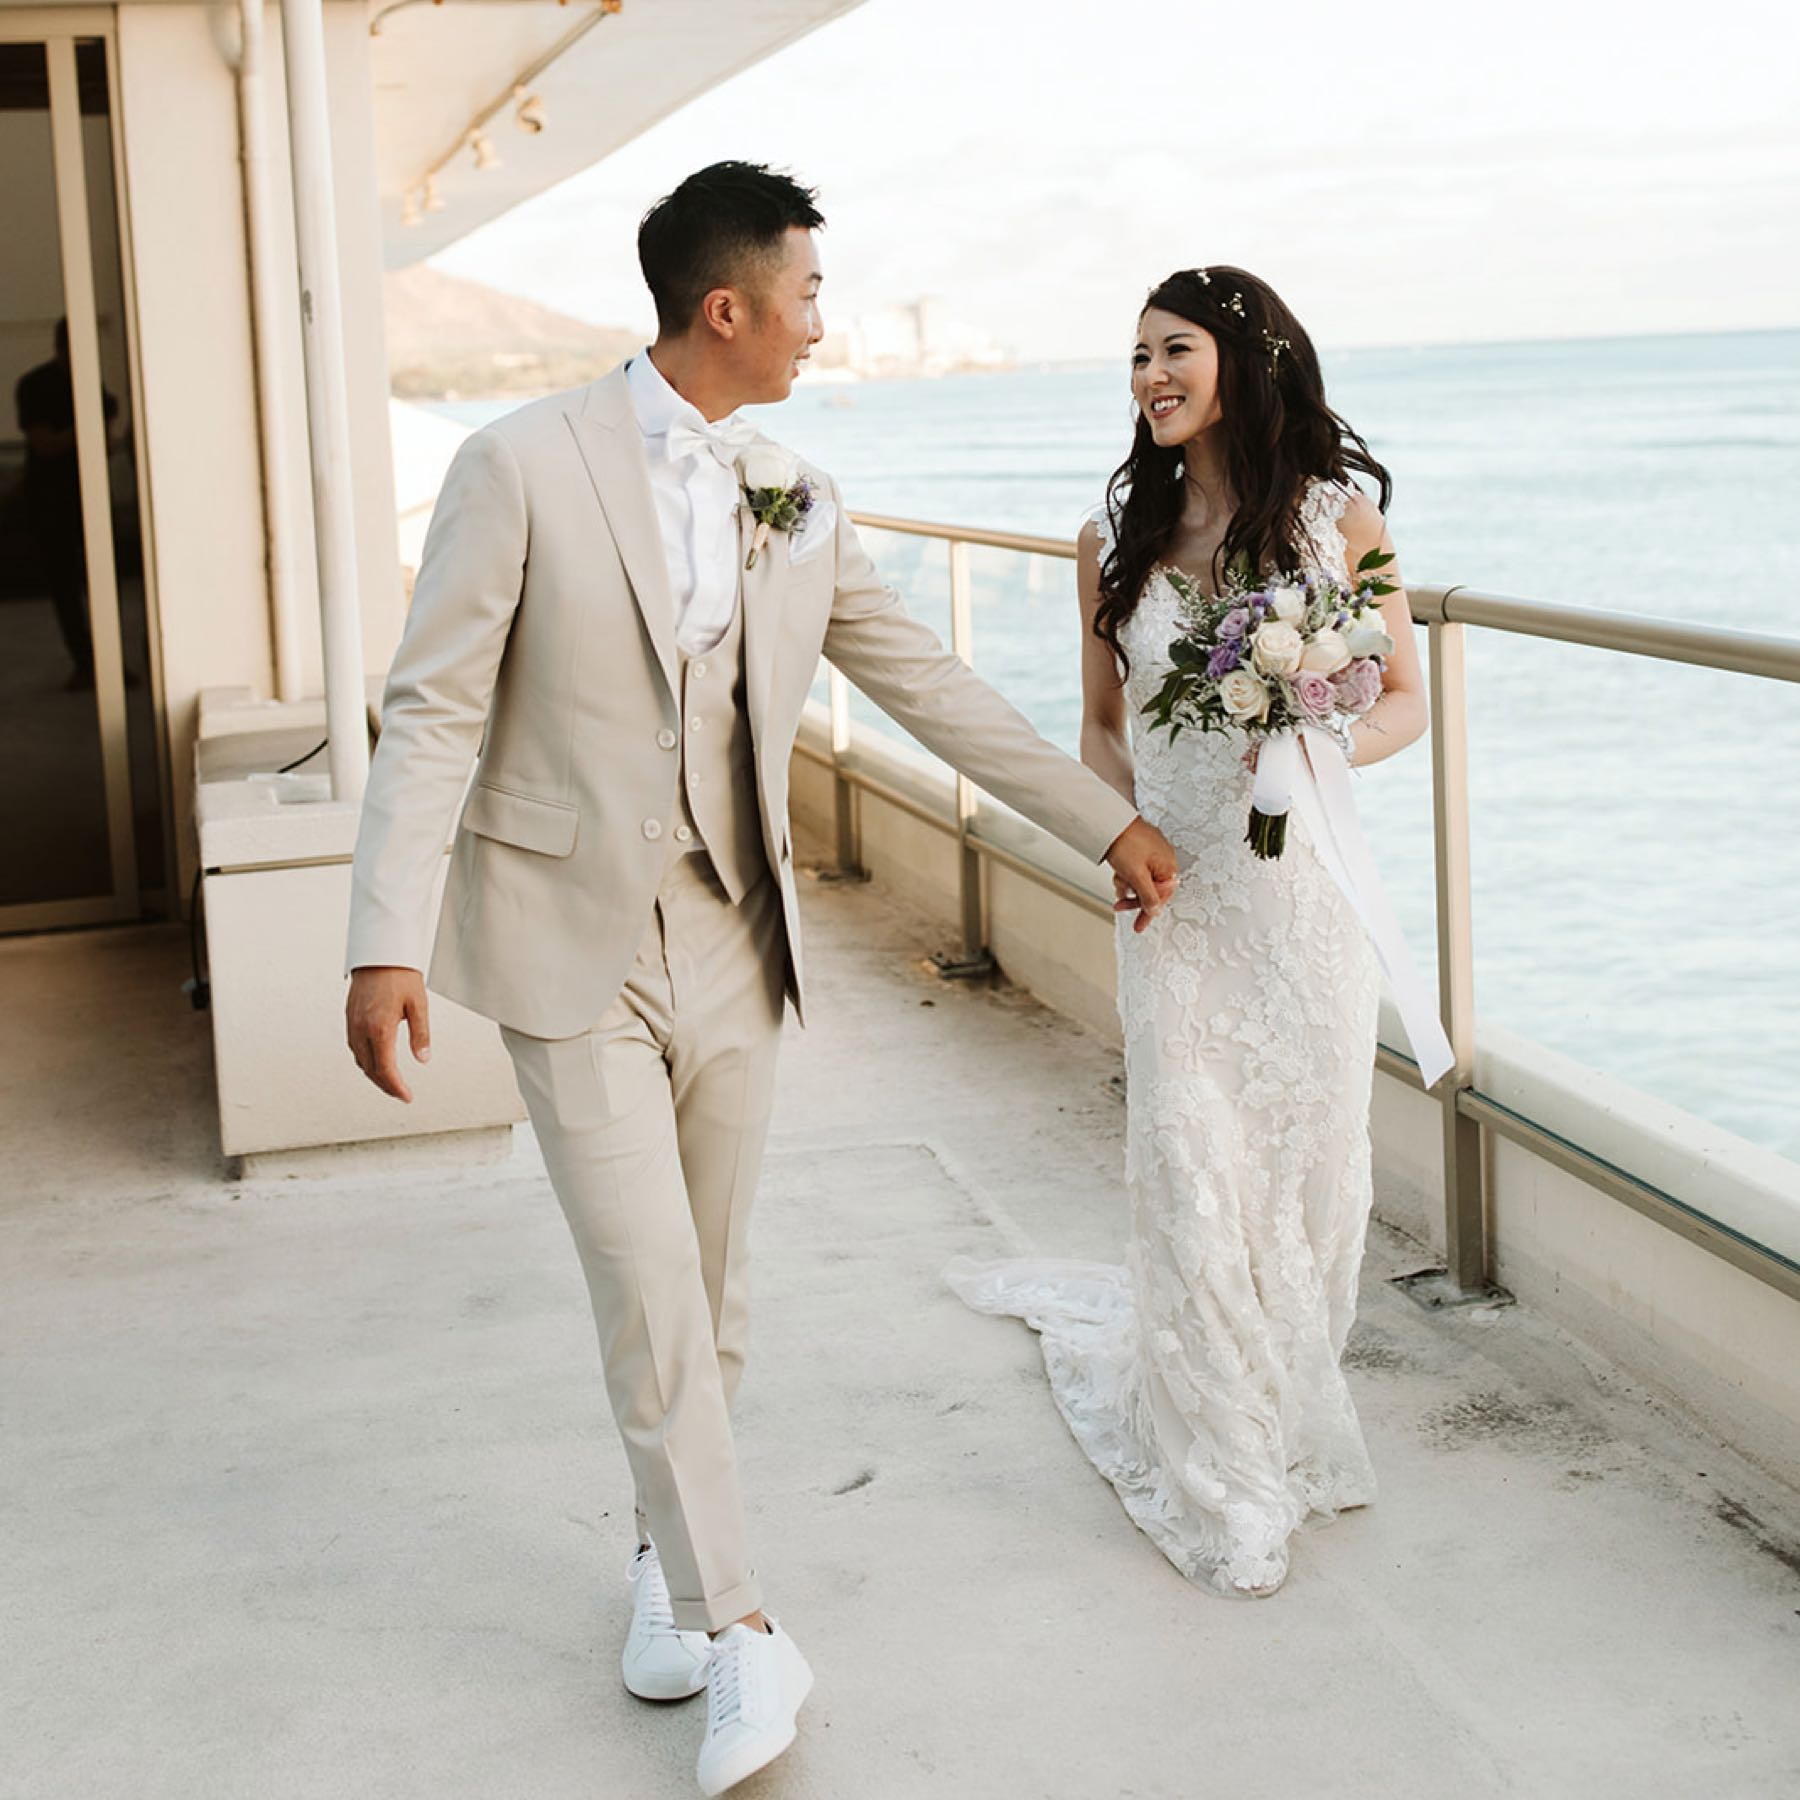 footer-wedding-image-10